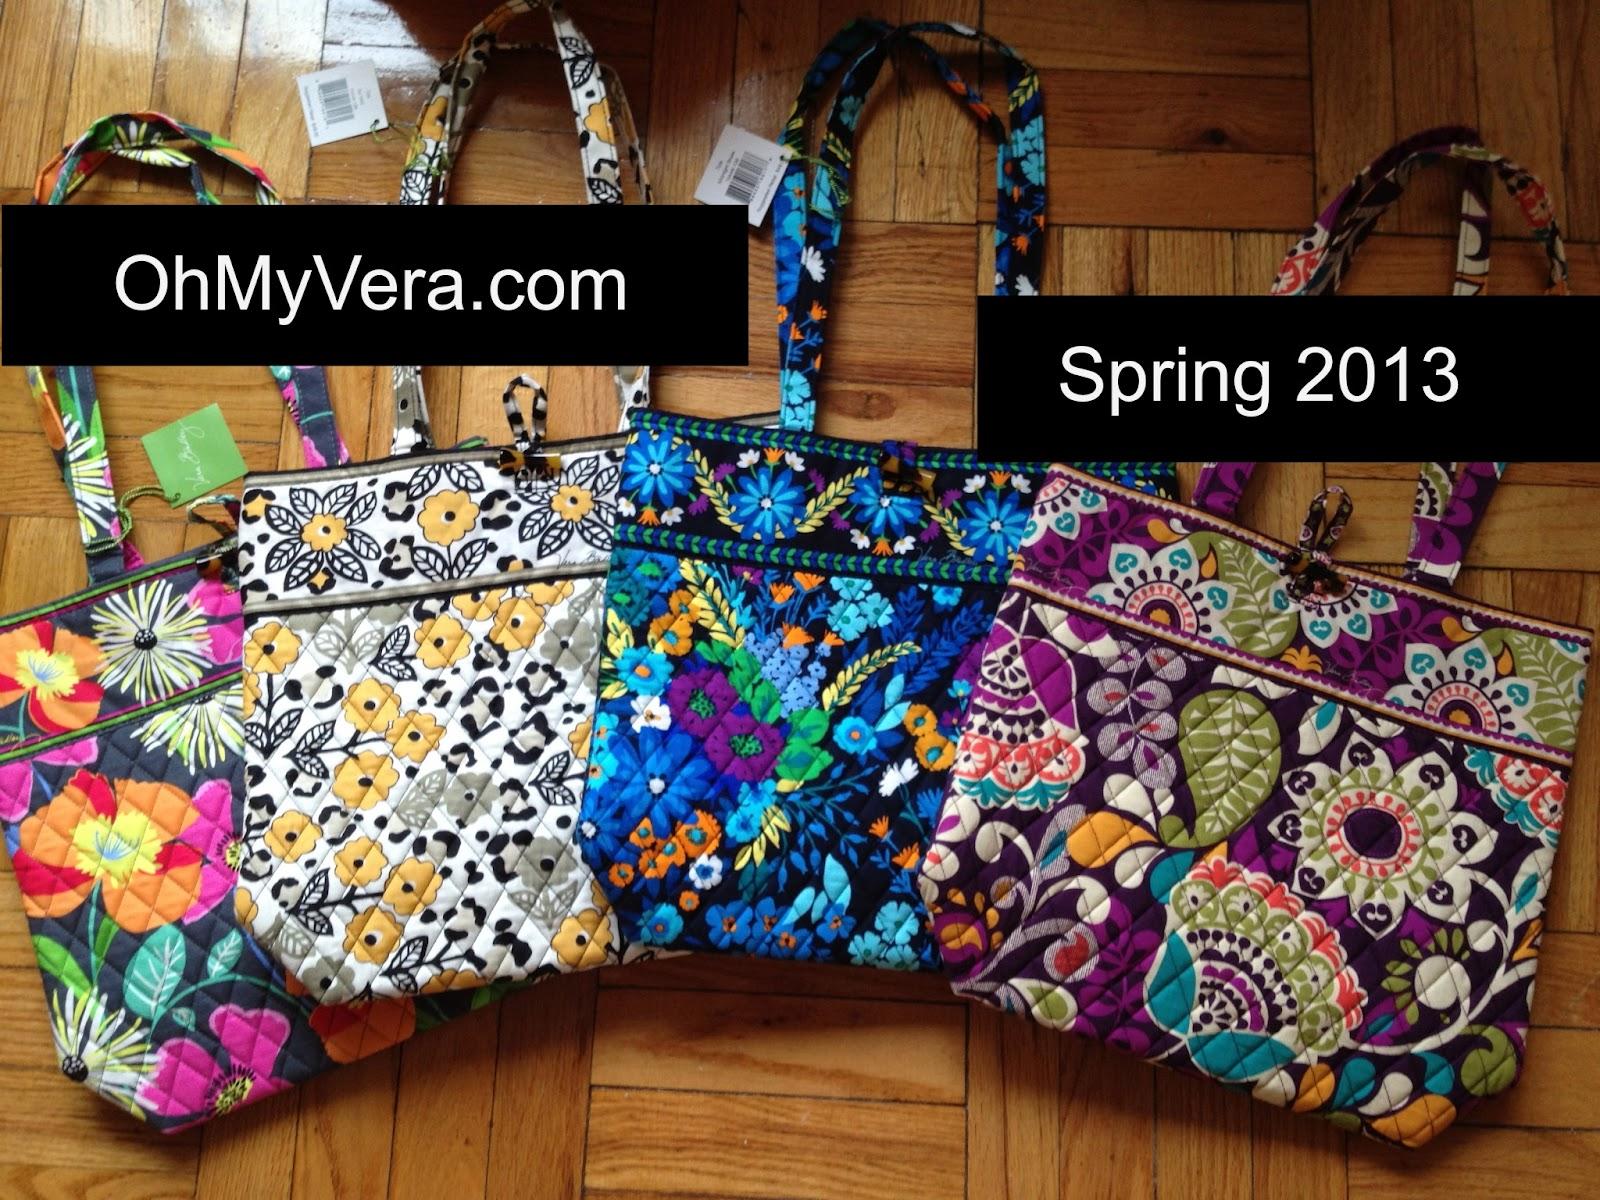 b6f7b12fa4bf OhMyVera! A blog about all things Vera Bradley  Vera Bradley Spring ...